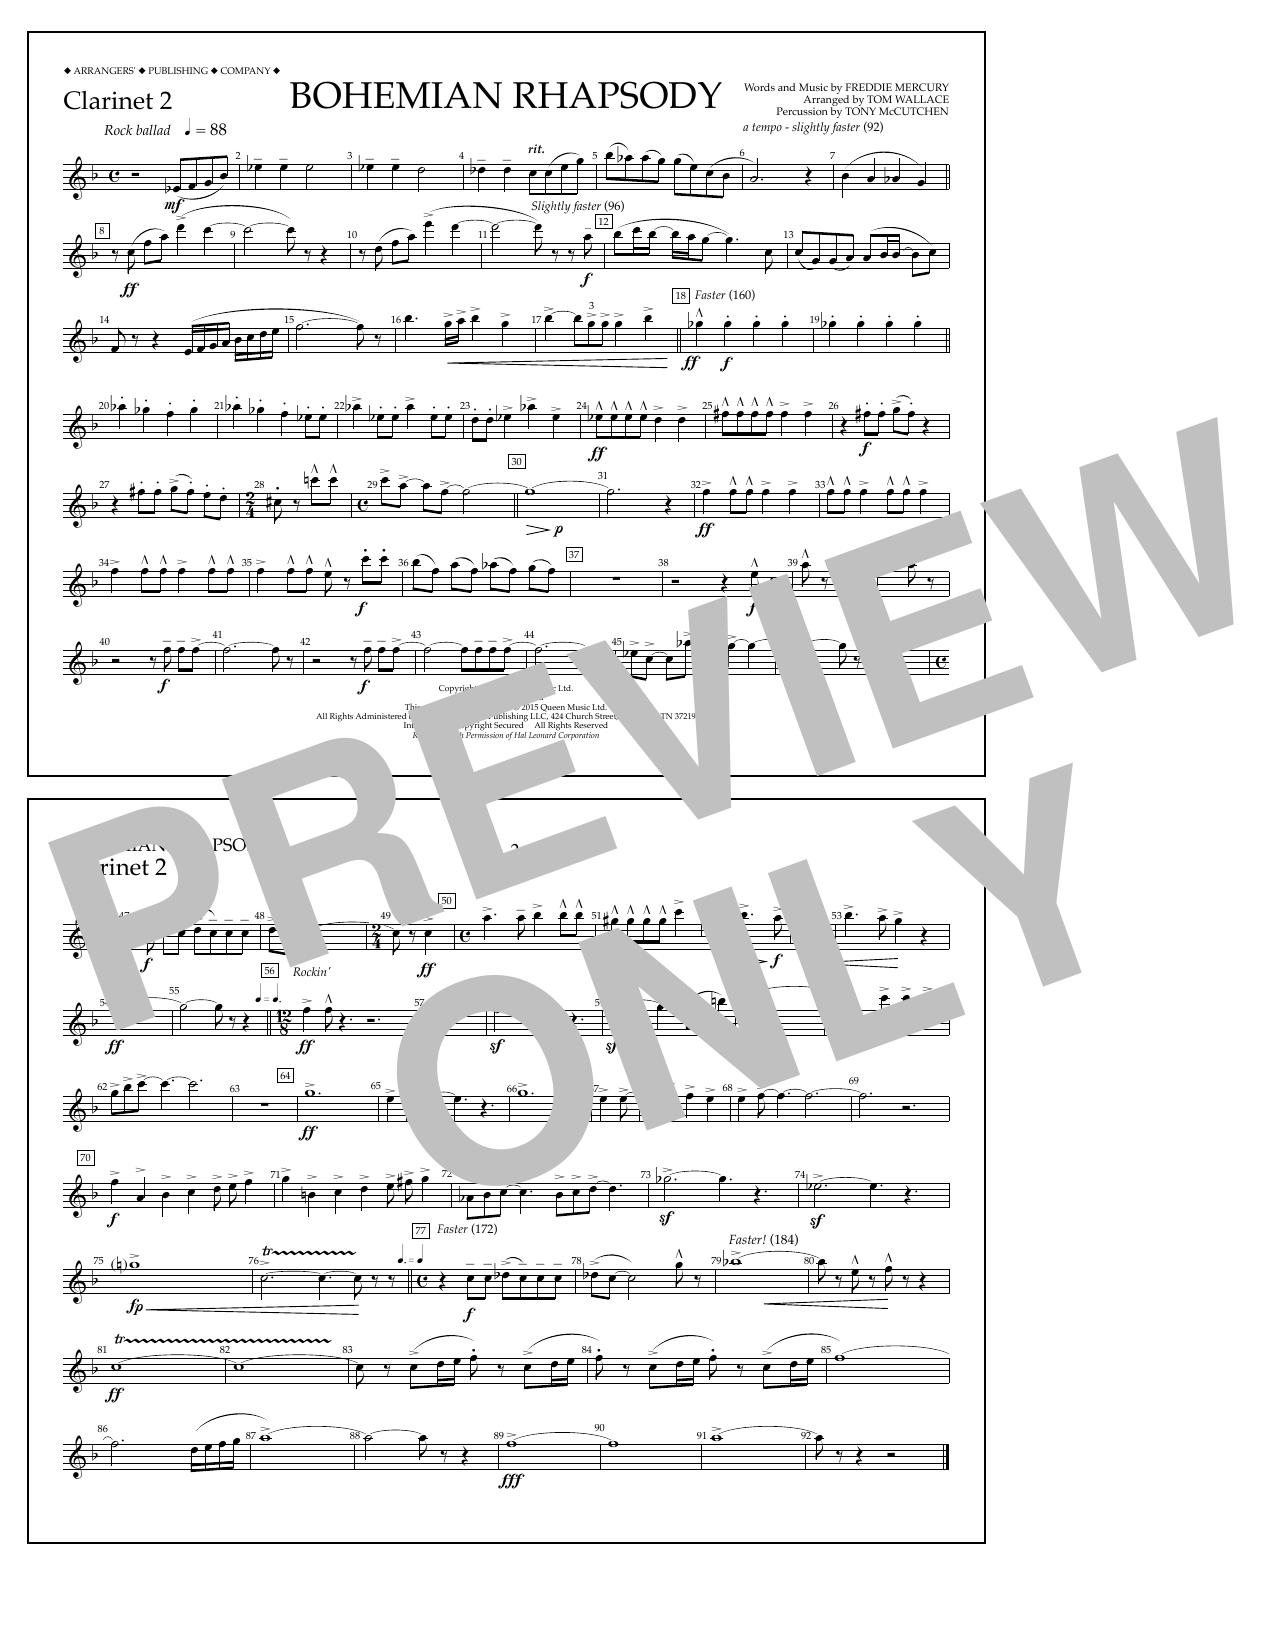 Bohemian Rhapsody - Clarinet 2 (Marching Band)